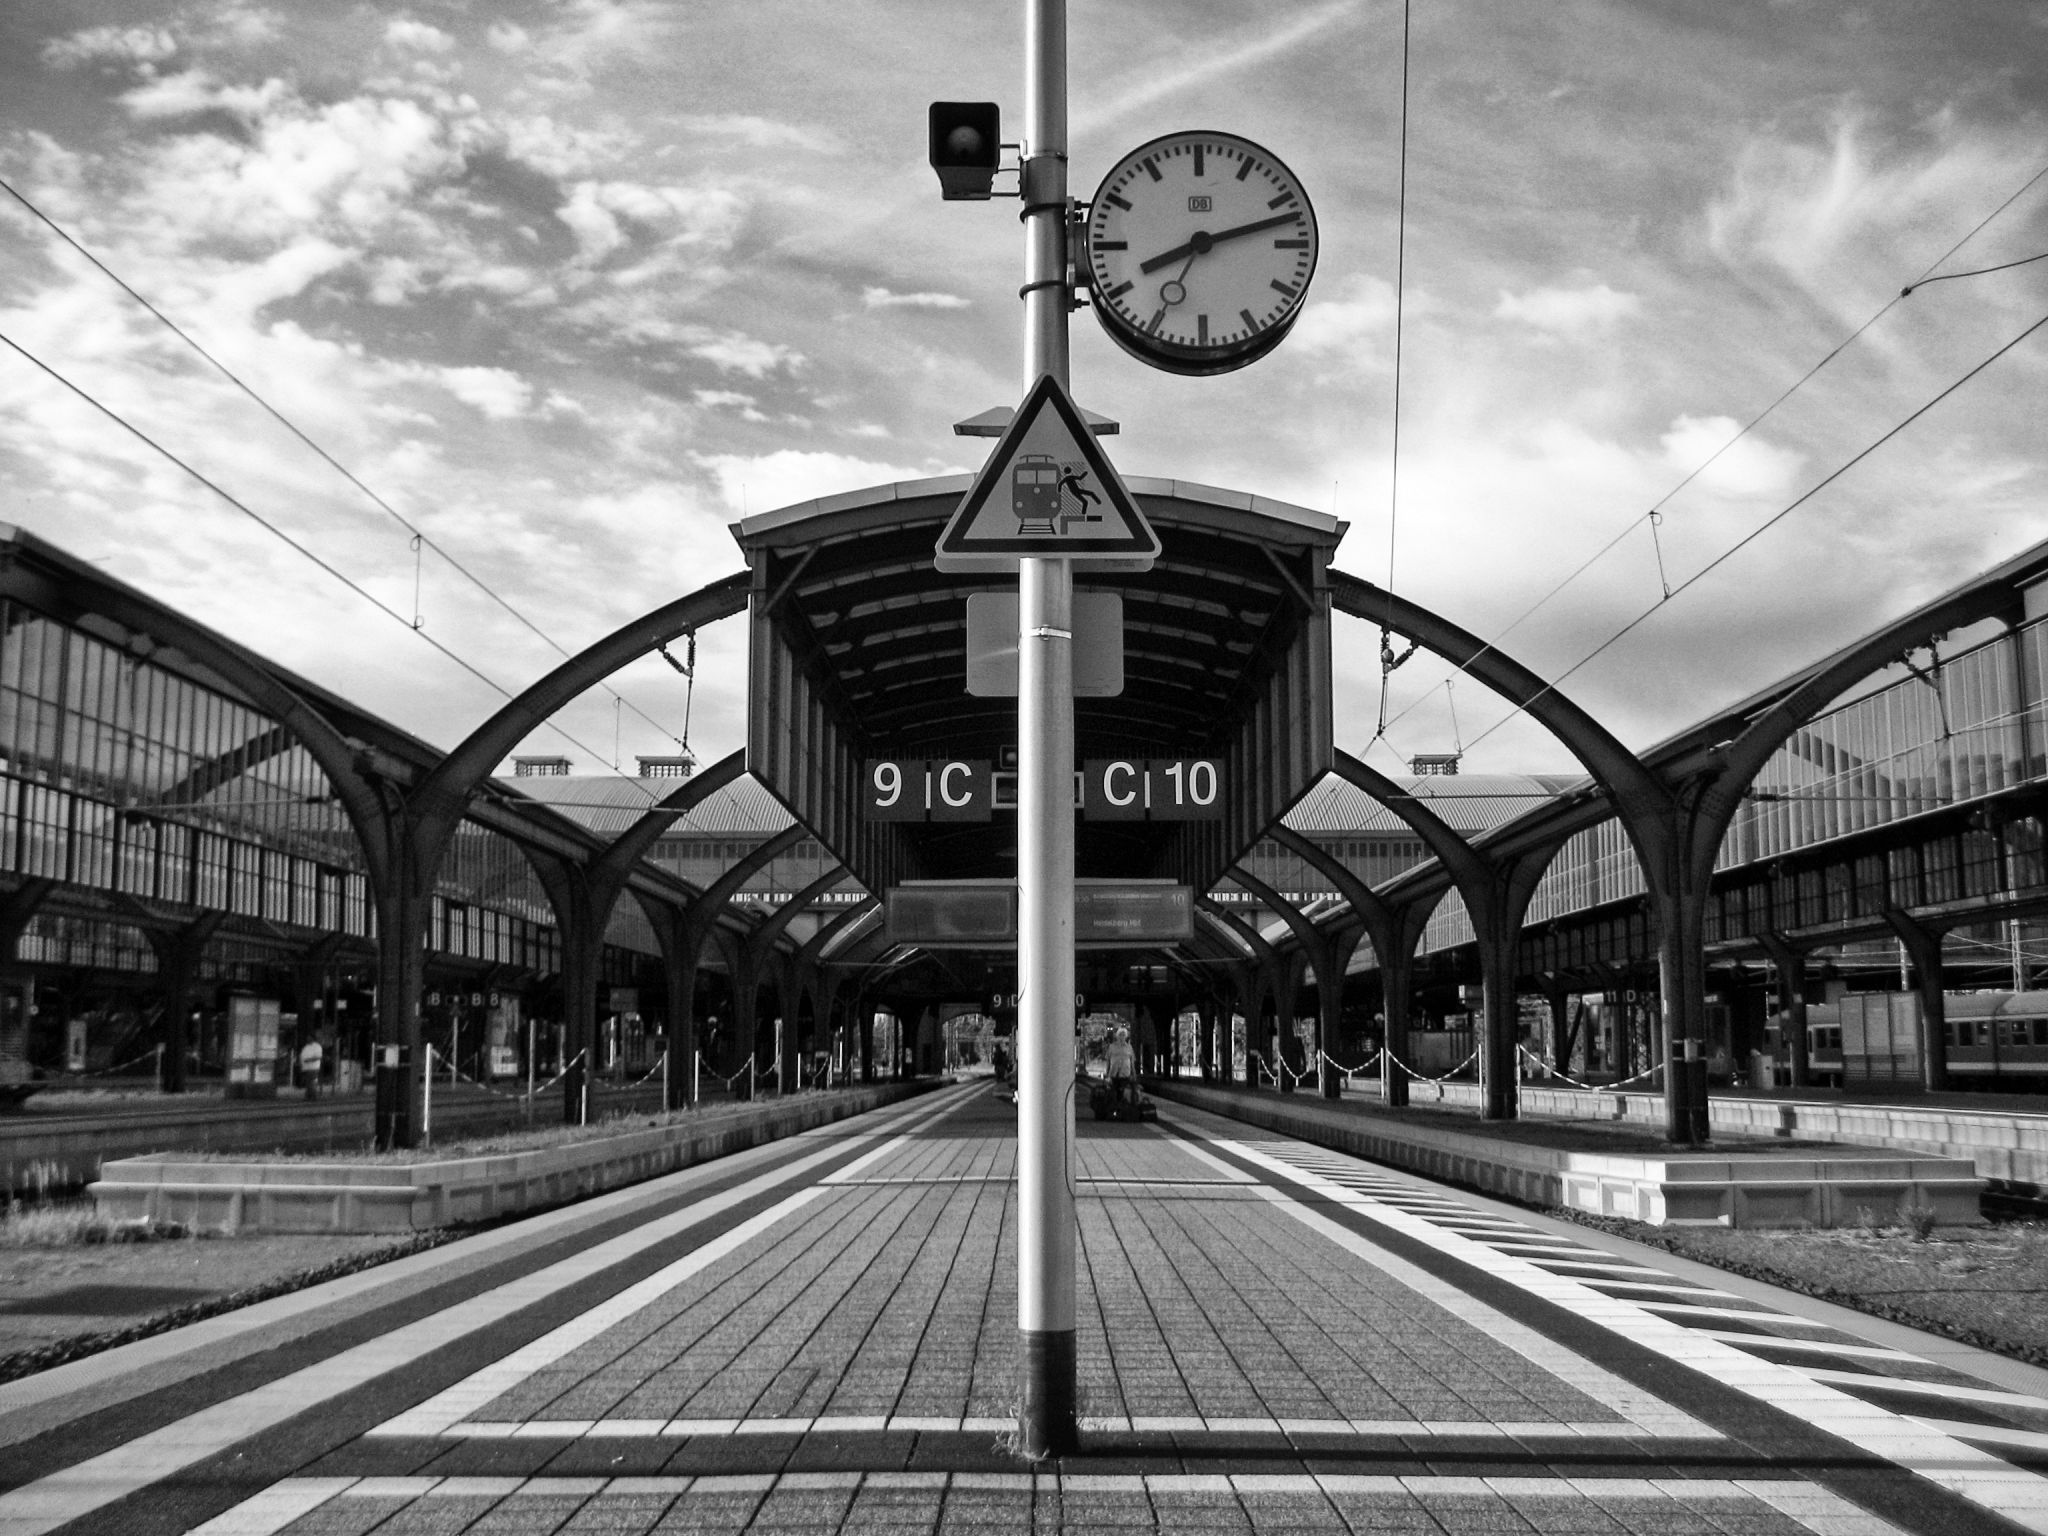 Darmstadt Main Station, Germany